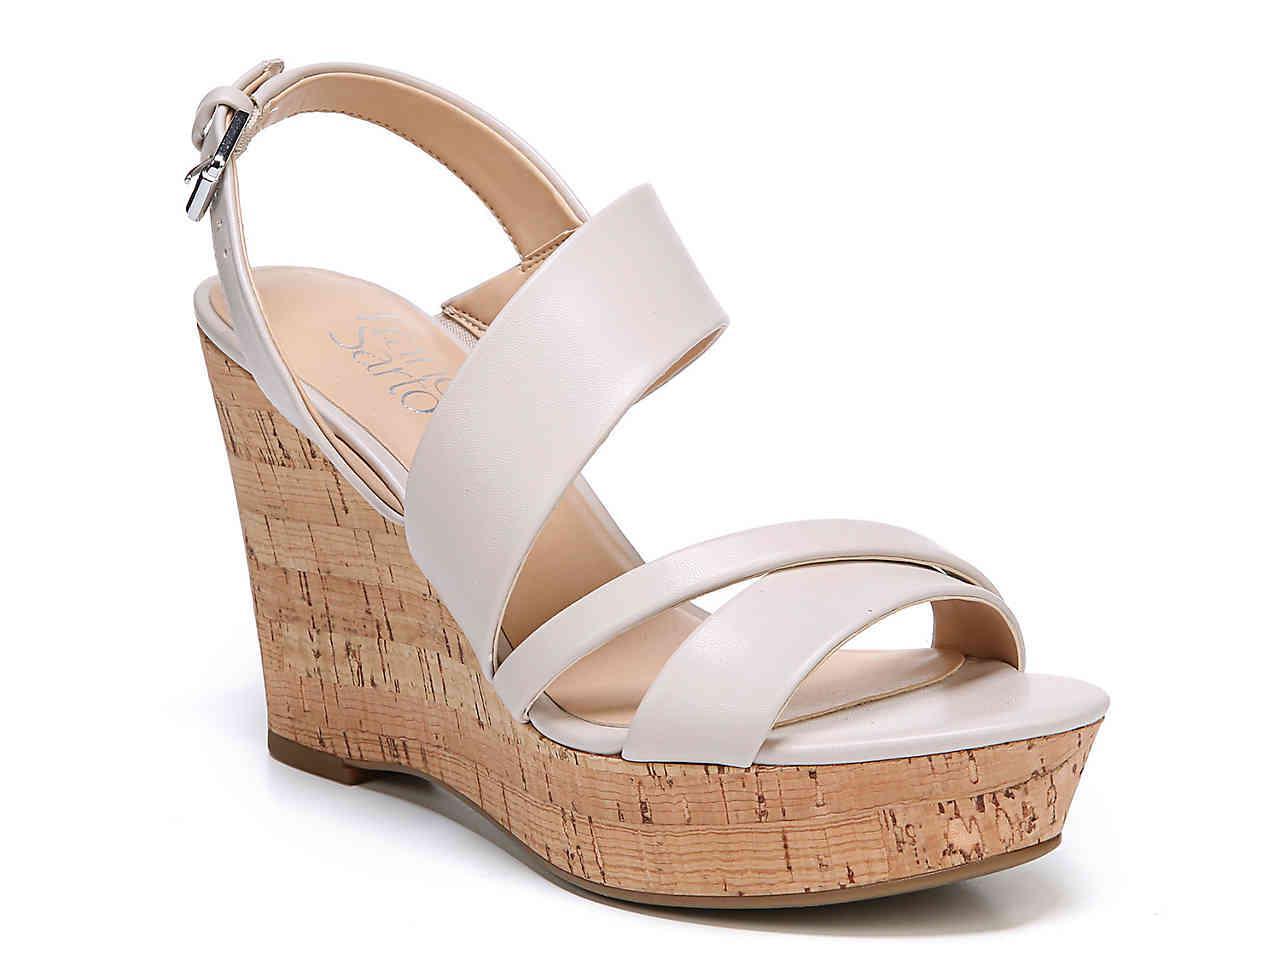 ff4ea1c392a9 Lyst - Franco Sarto Seneca Wedge Sandal in White